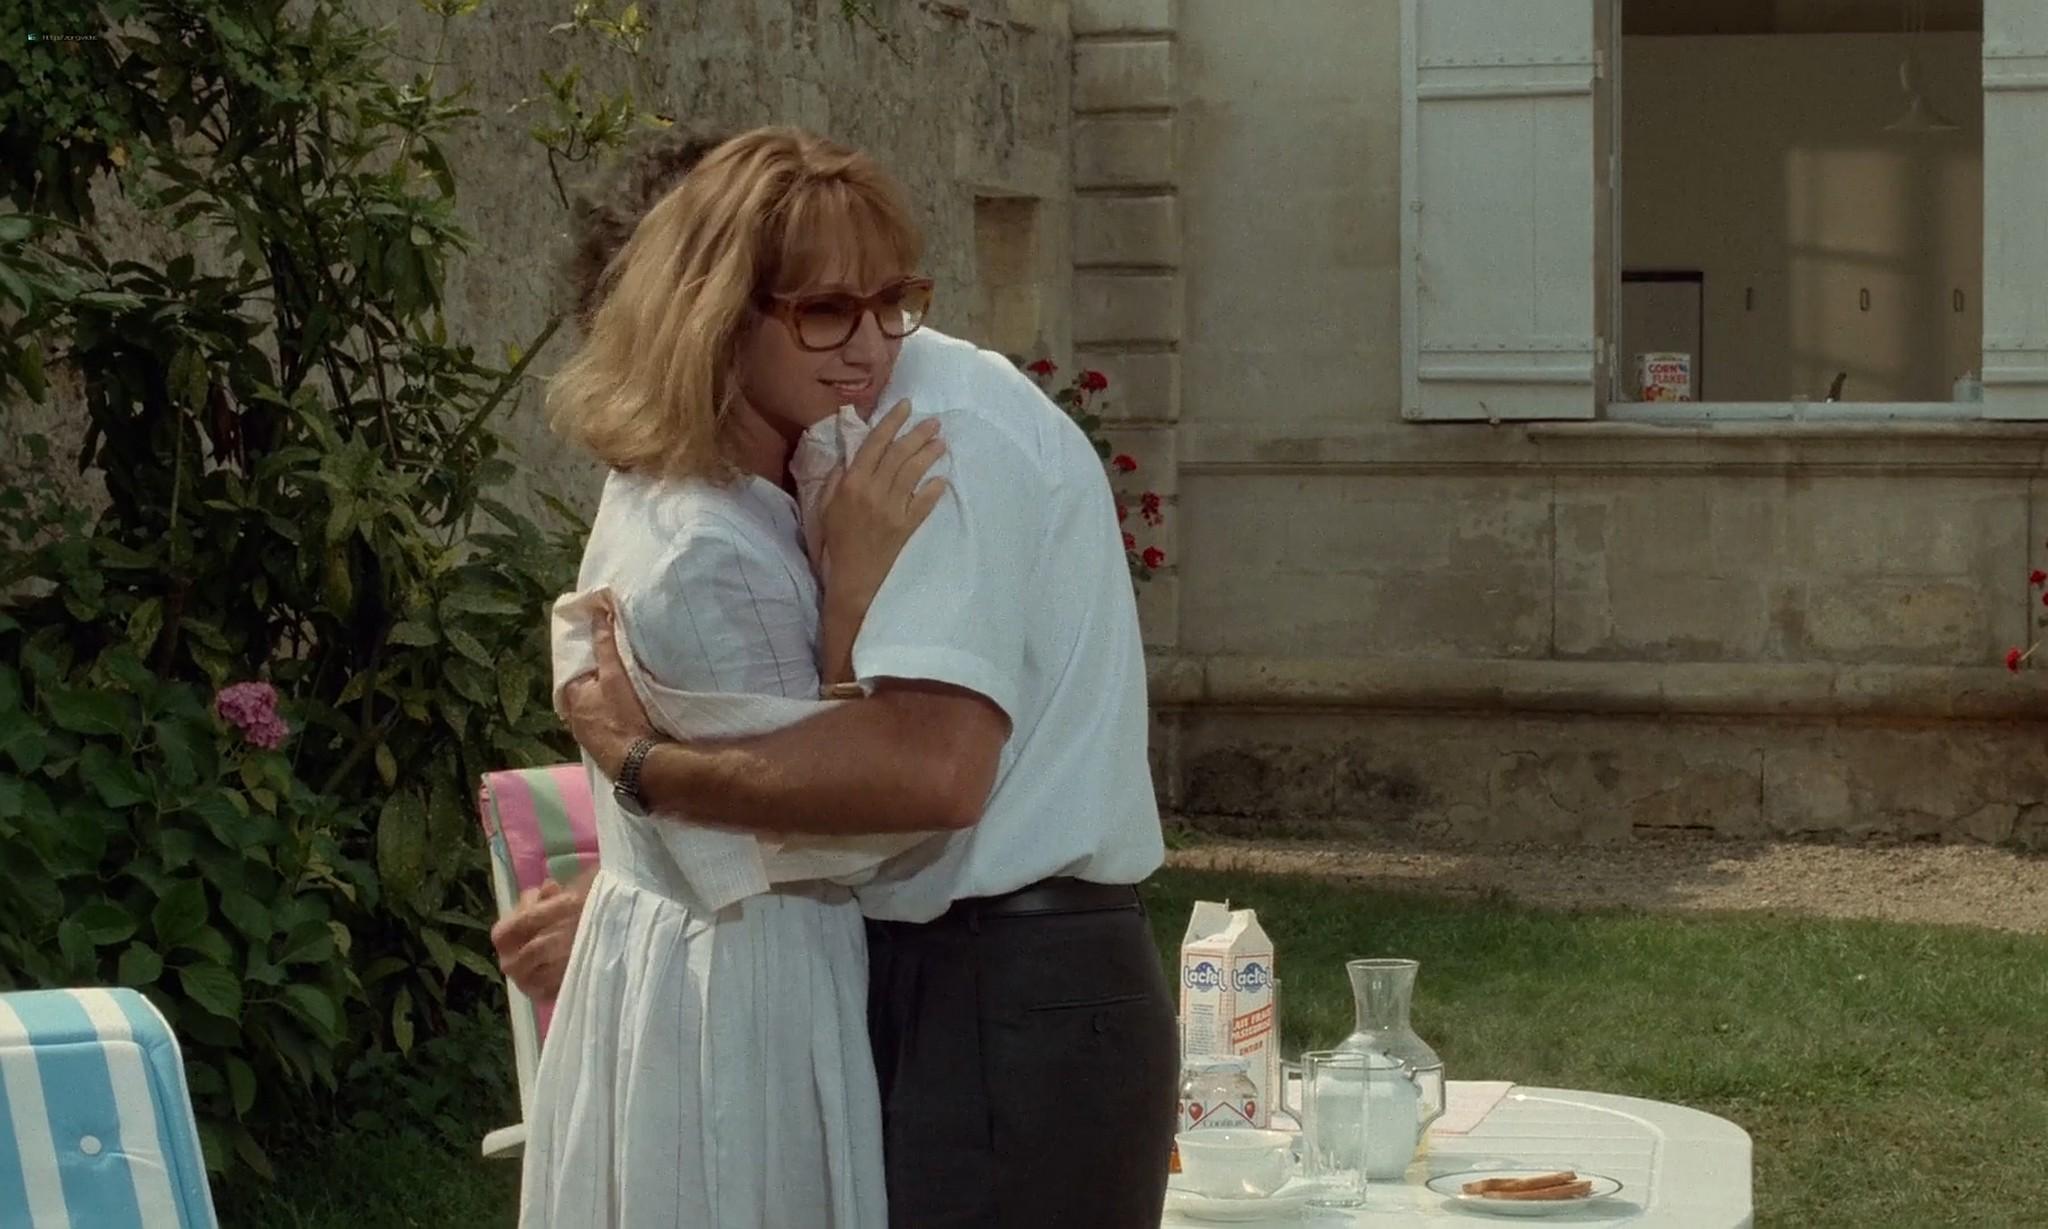 Nathalie Baye nude in the shower En toute innocence FR 1988 1080p BluRay